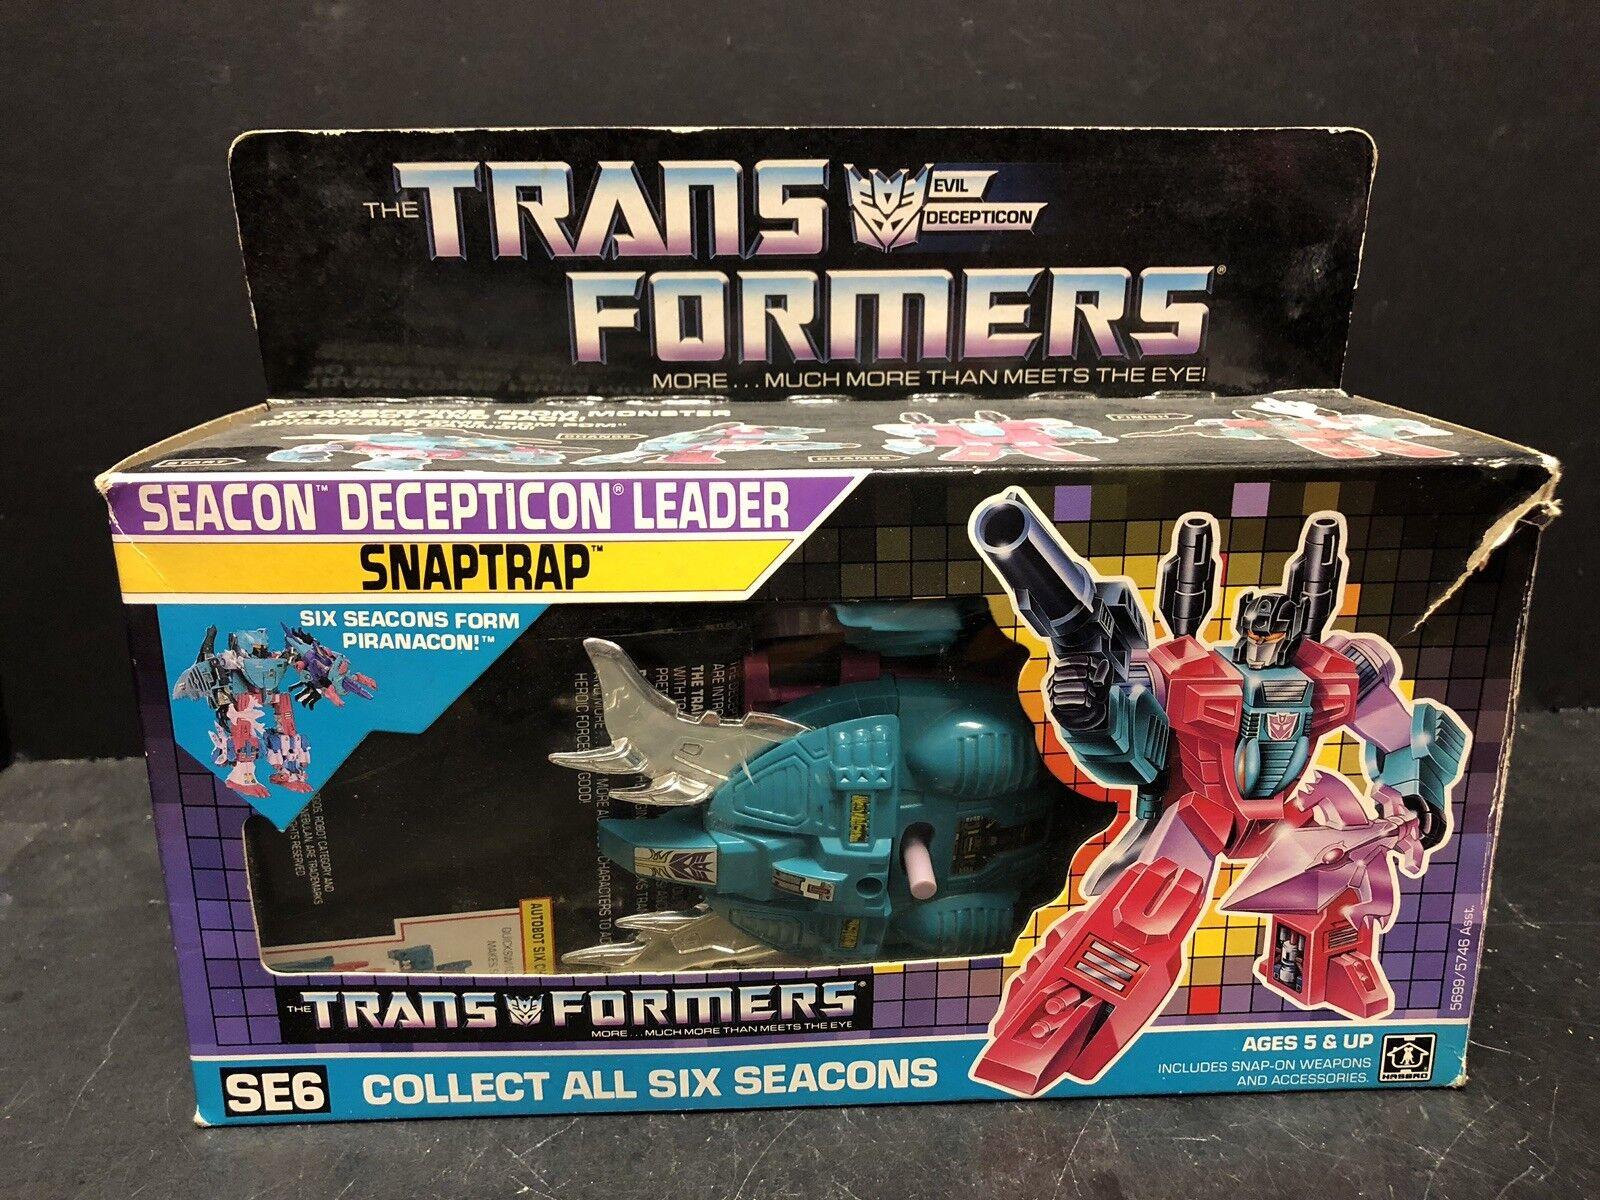 Web oficial Original Vintage 1987 Transformers G1 SEACON SEACON SEACON Snaptrap Completo Con Caja AM0016  compras de moda online